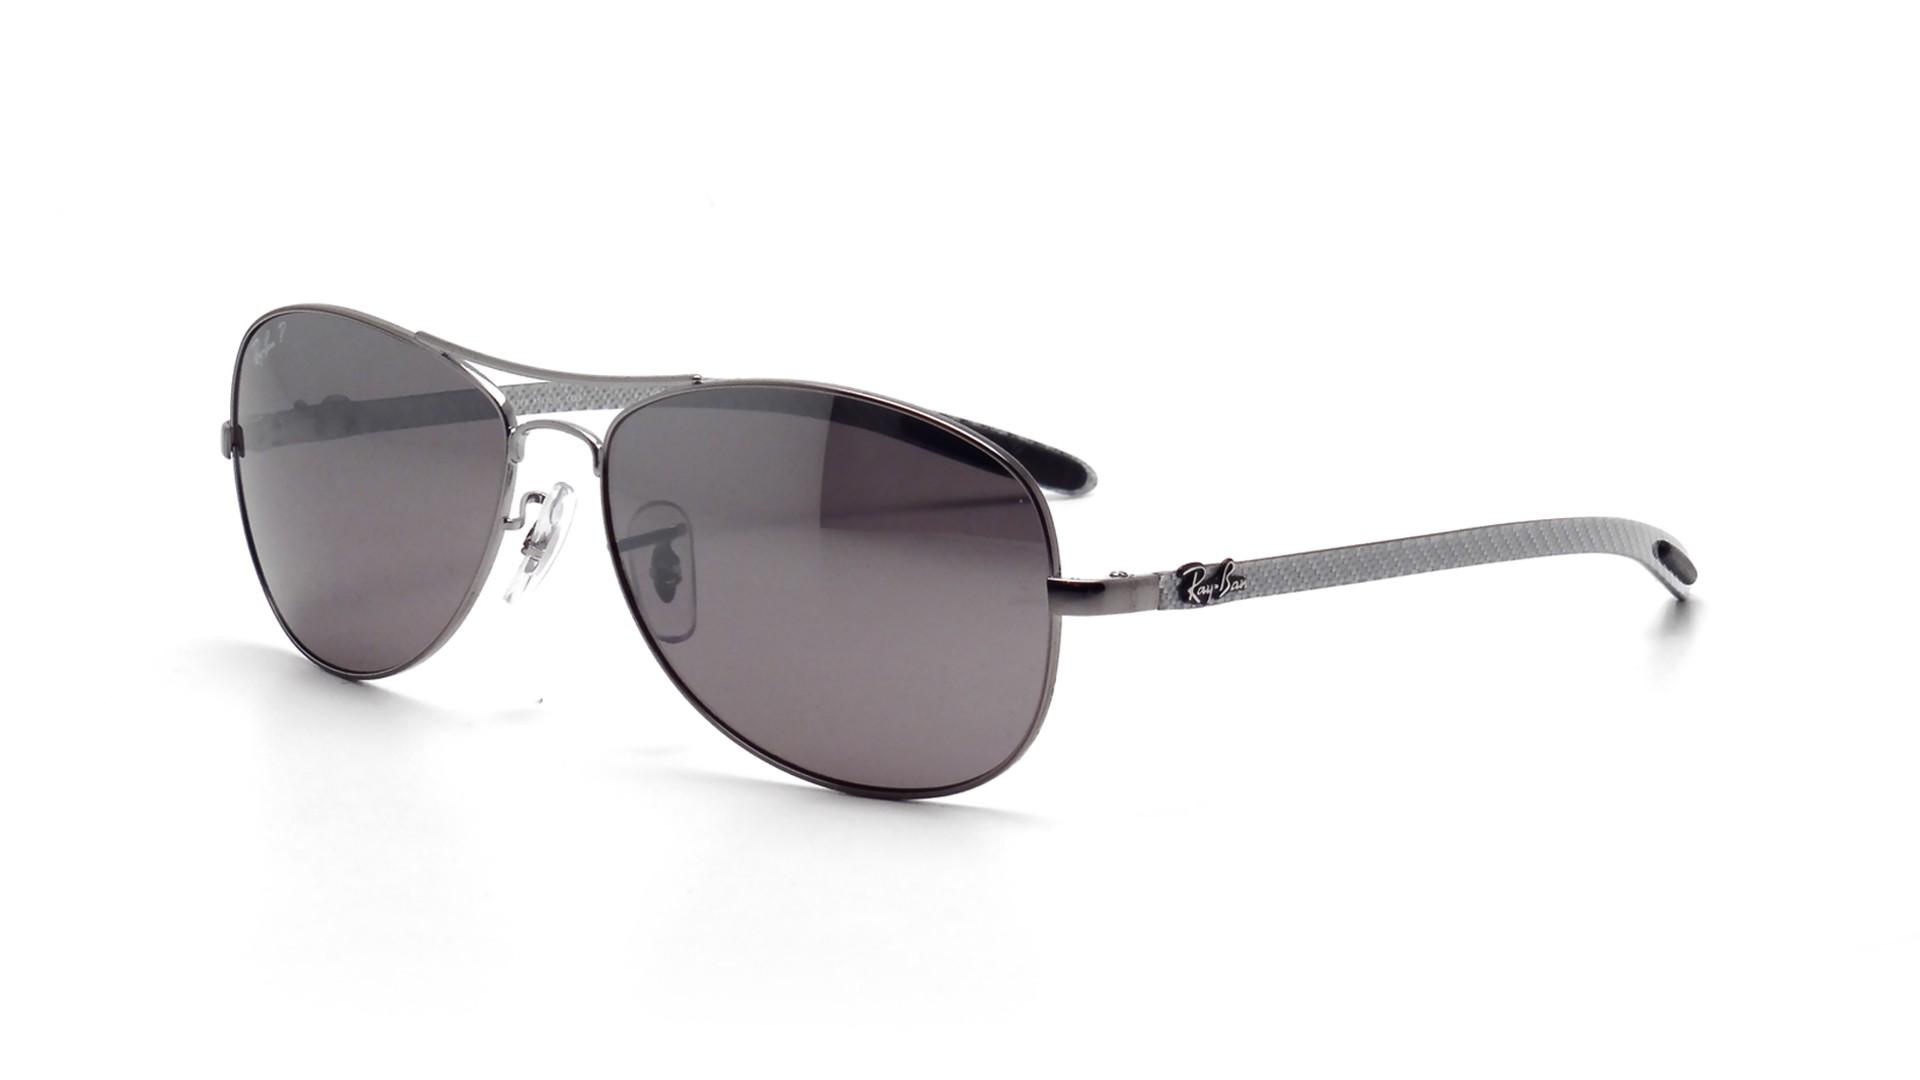 f7a2f3e86d Sunglasses Ray-Ban Fibre Carbon Grey RB8301 004 N8 59-14 Large Polarized  Mirror